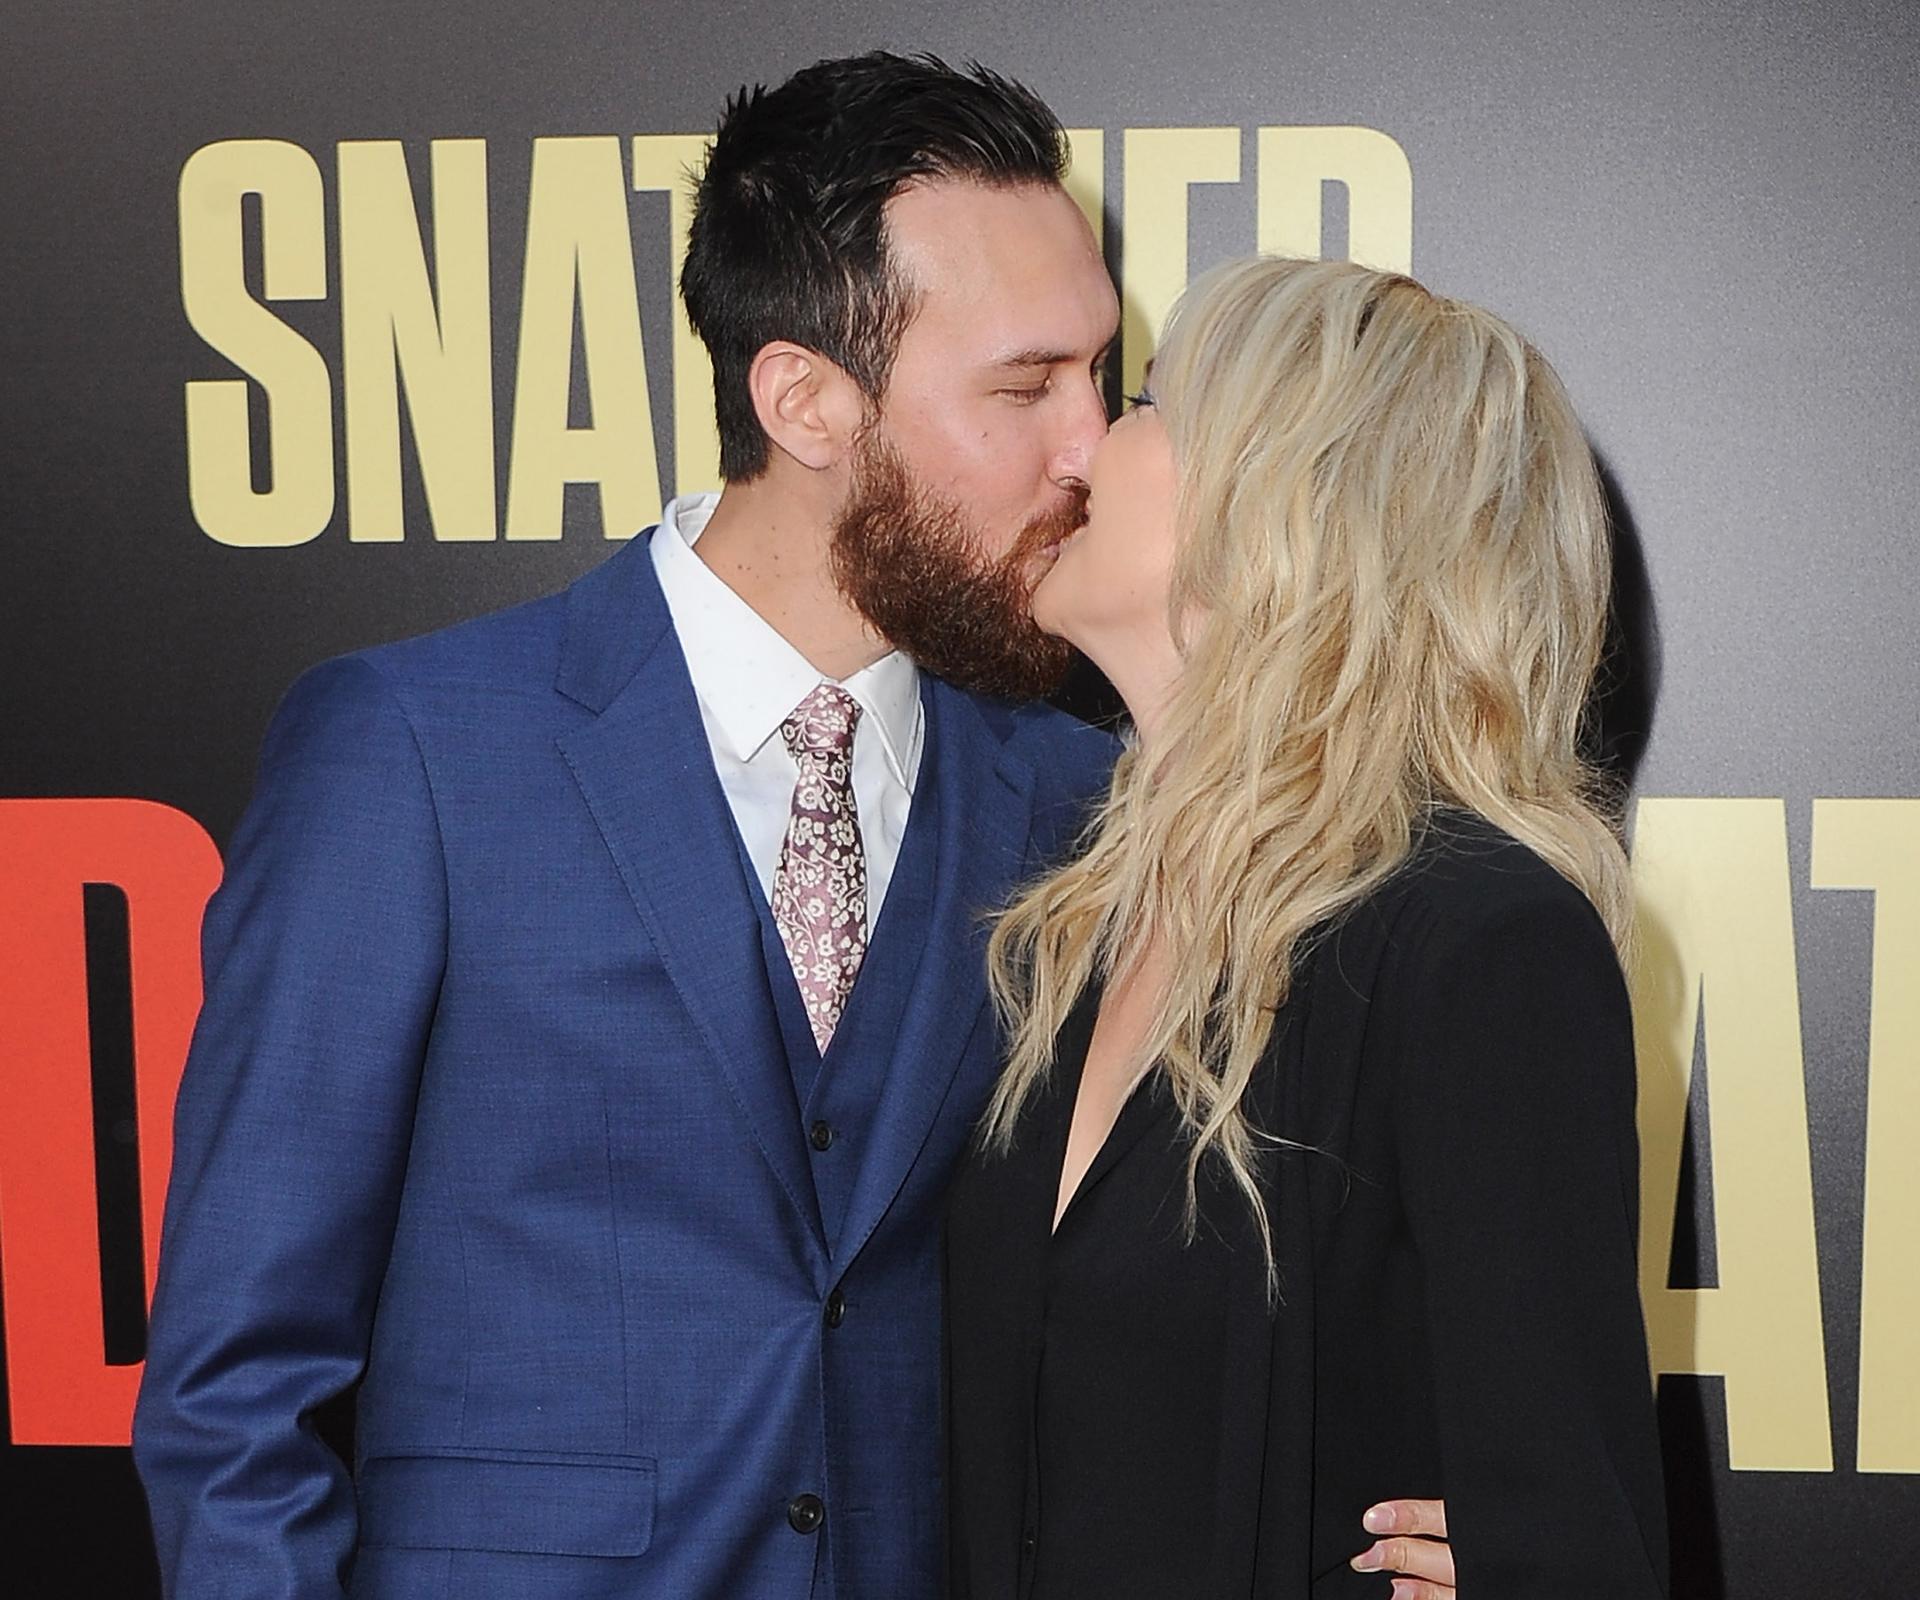 5 things to know about Kate Hudson's boyfriend Danny Fujikawa